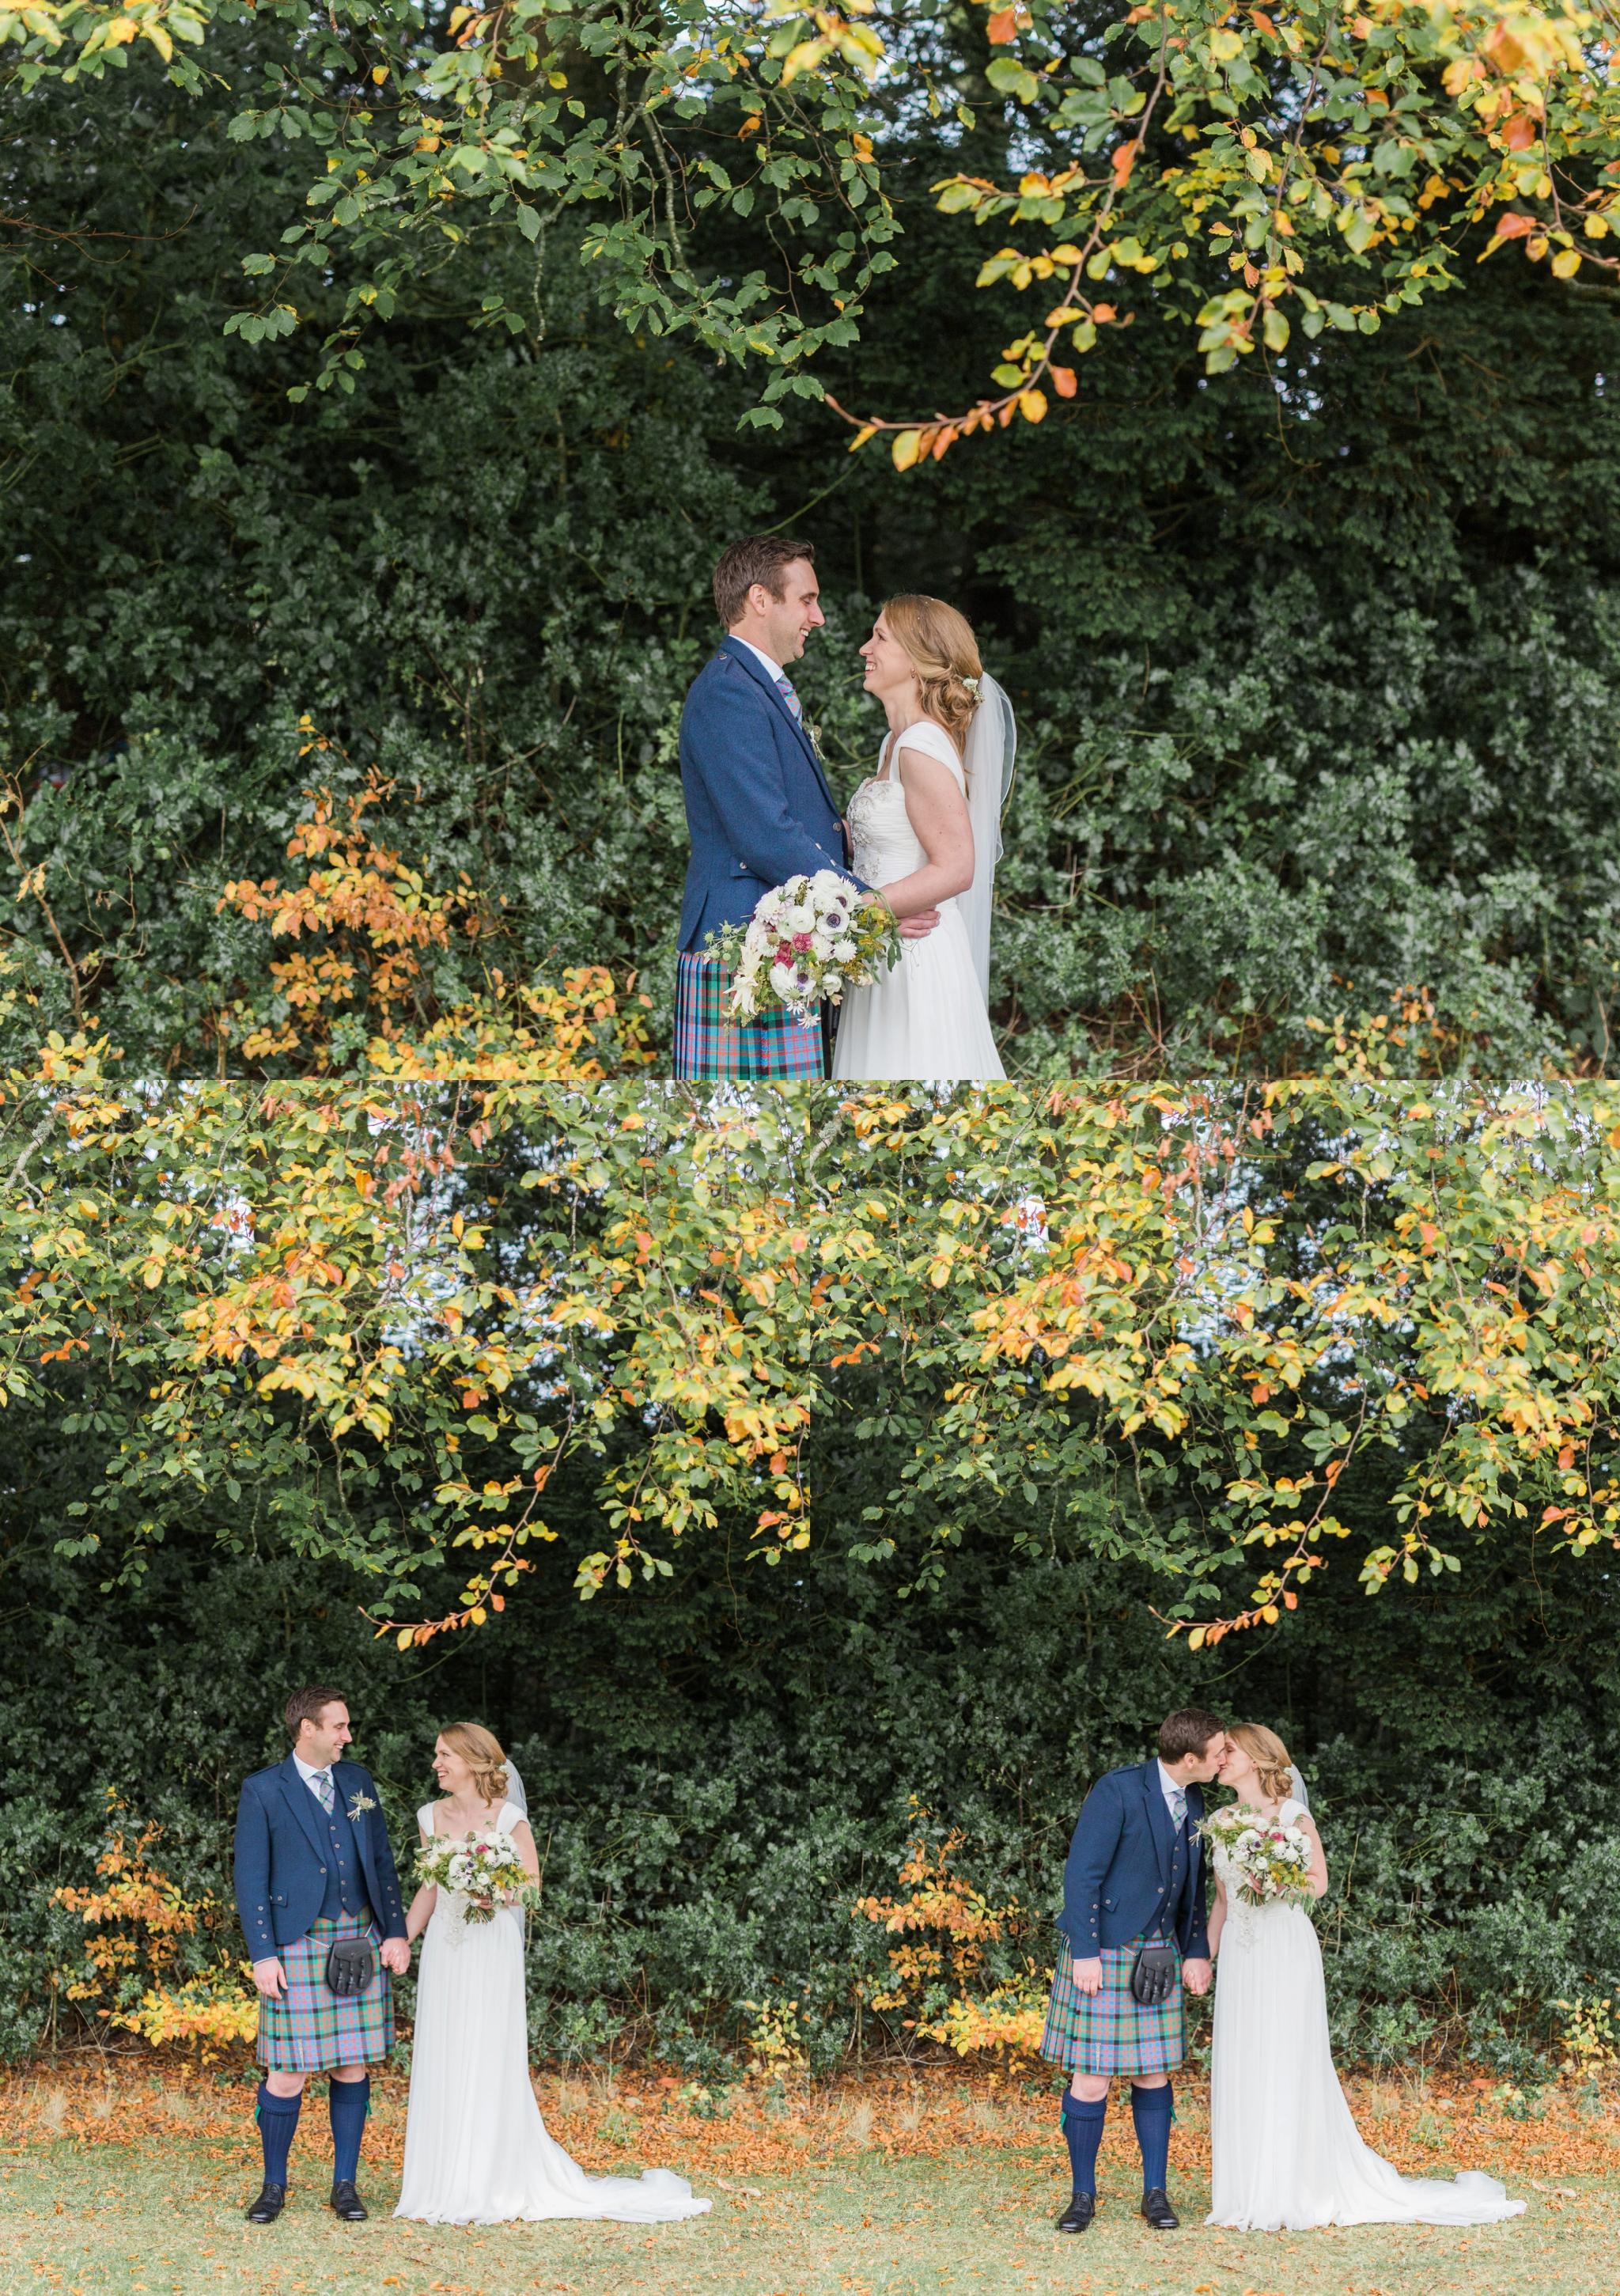 Suzanne_li_photography_kirknewton_wedding_0033.jpg